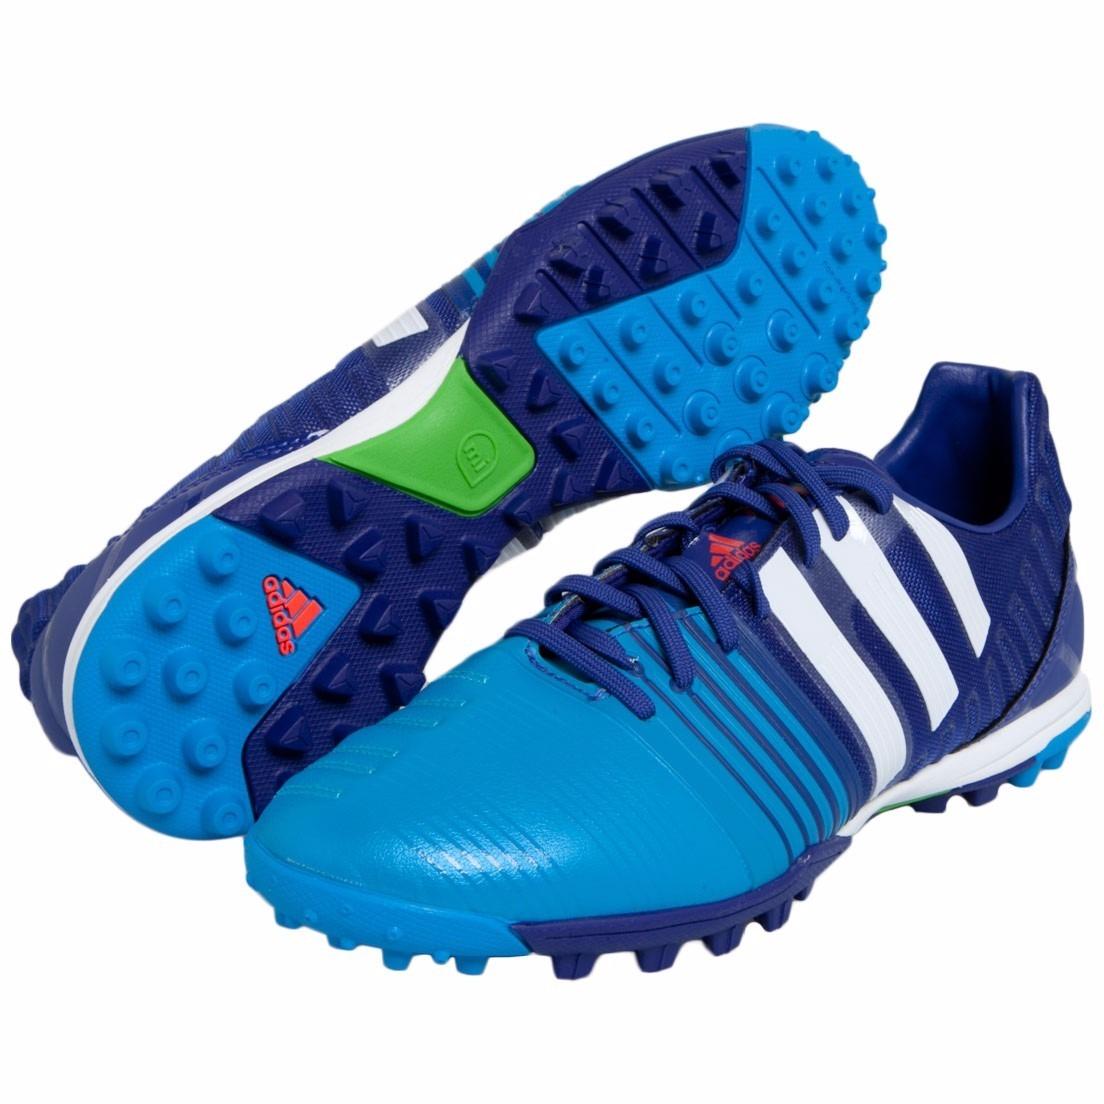 chuteira society tf adidas nitrocharge 2.0 azul tam 41 nova. Carregando  zoom. 12b9d32455bd5